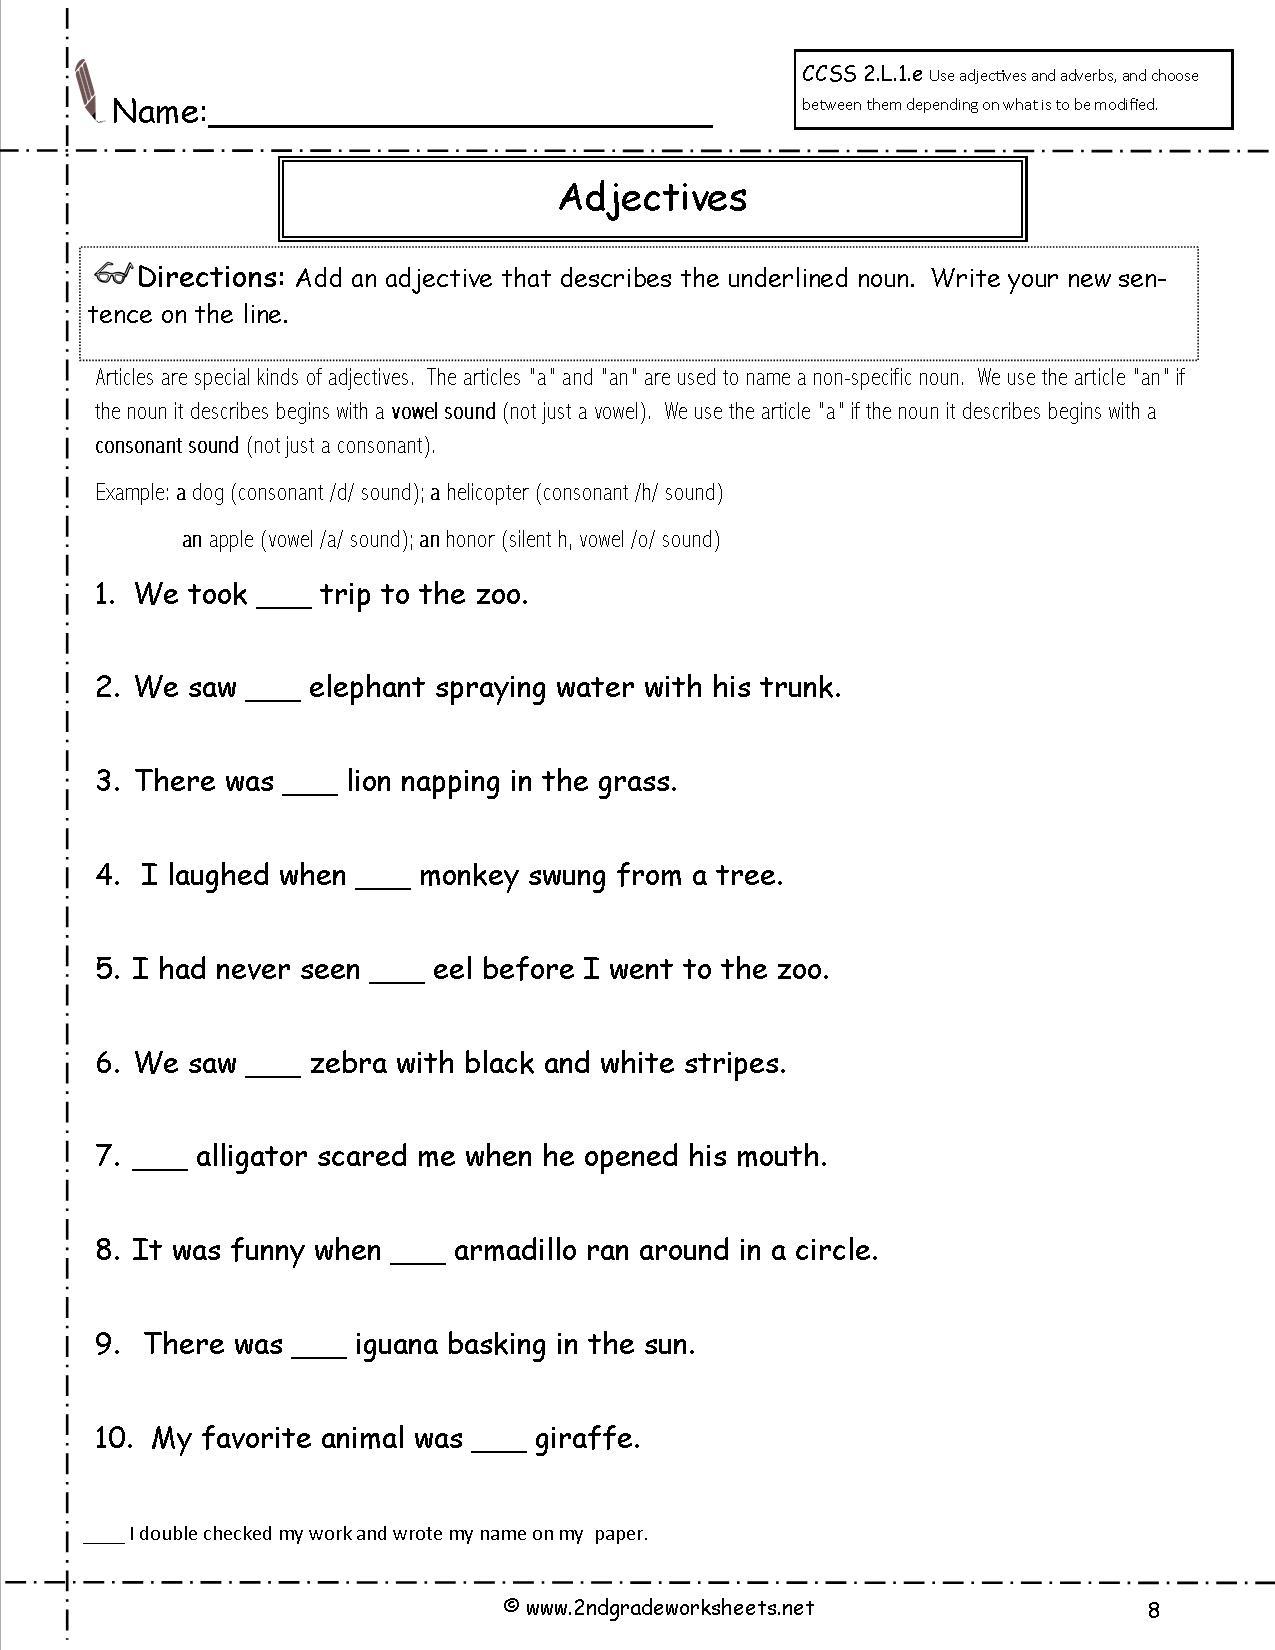 Free Language/grammar Worksheets And Printouts | Year 10 English Worksheets Printable